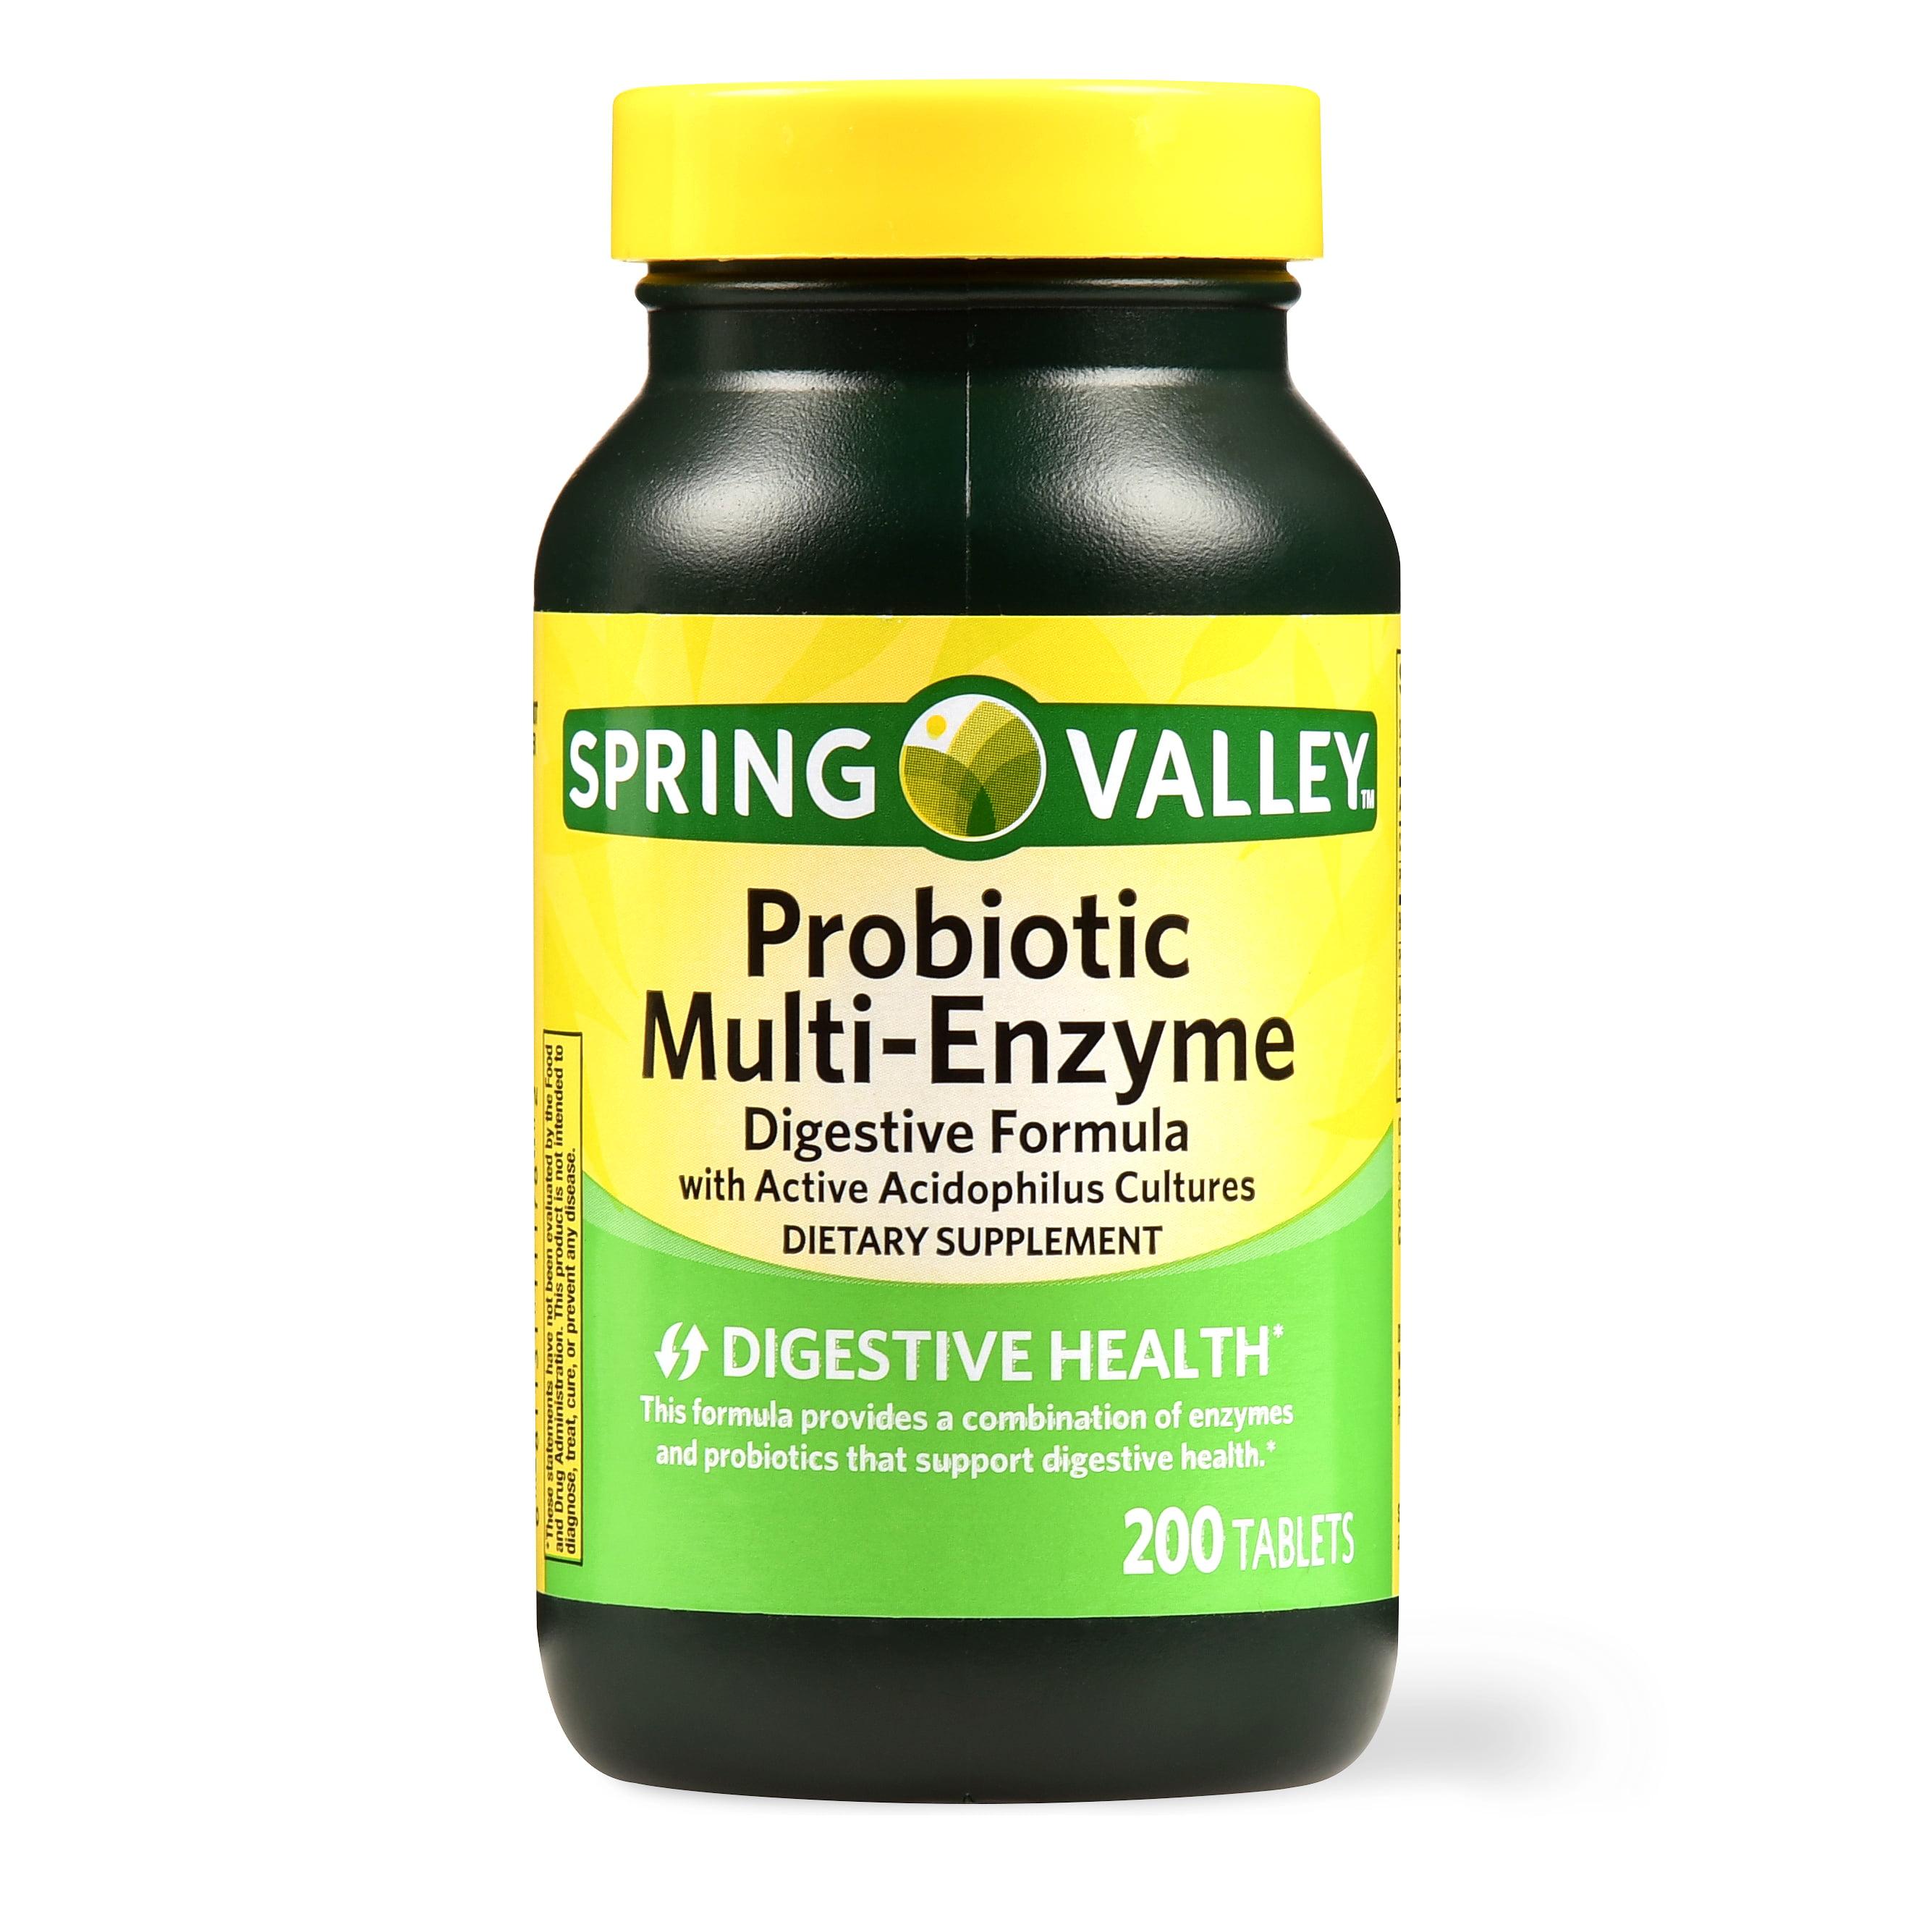 Spring Valley Probiotic Multi-Enzyme Digestive Formula Tablets, 200 Ct